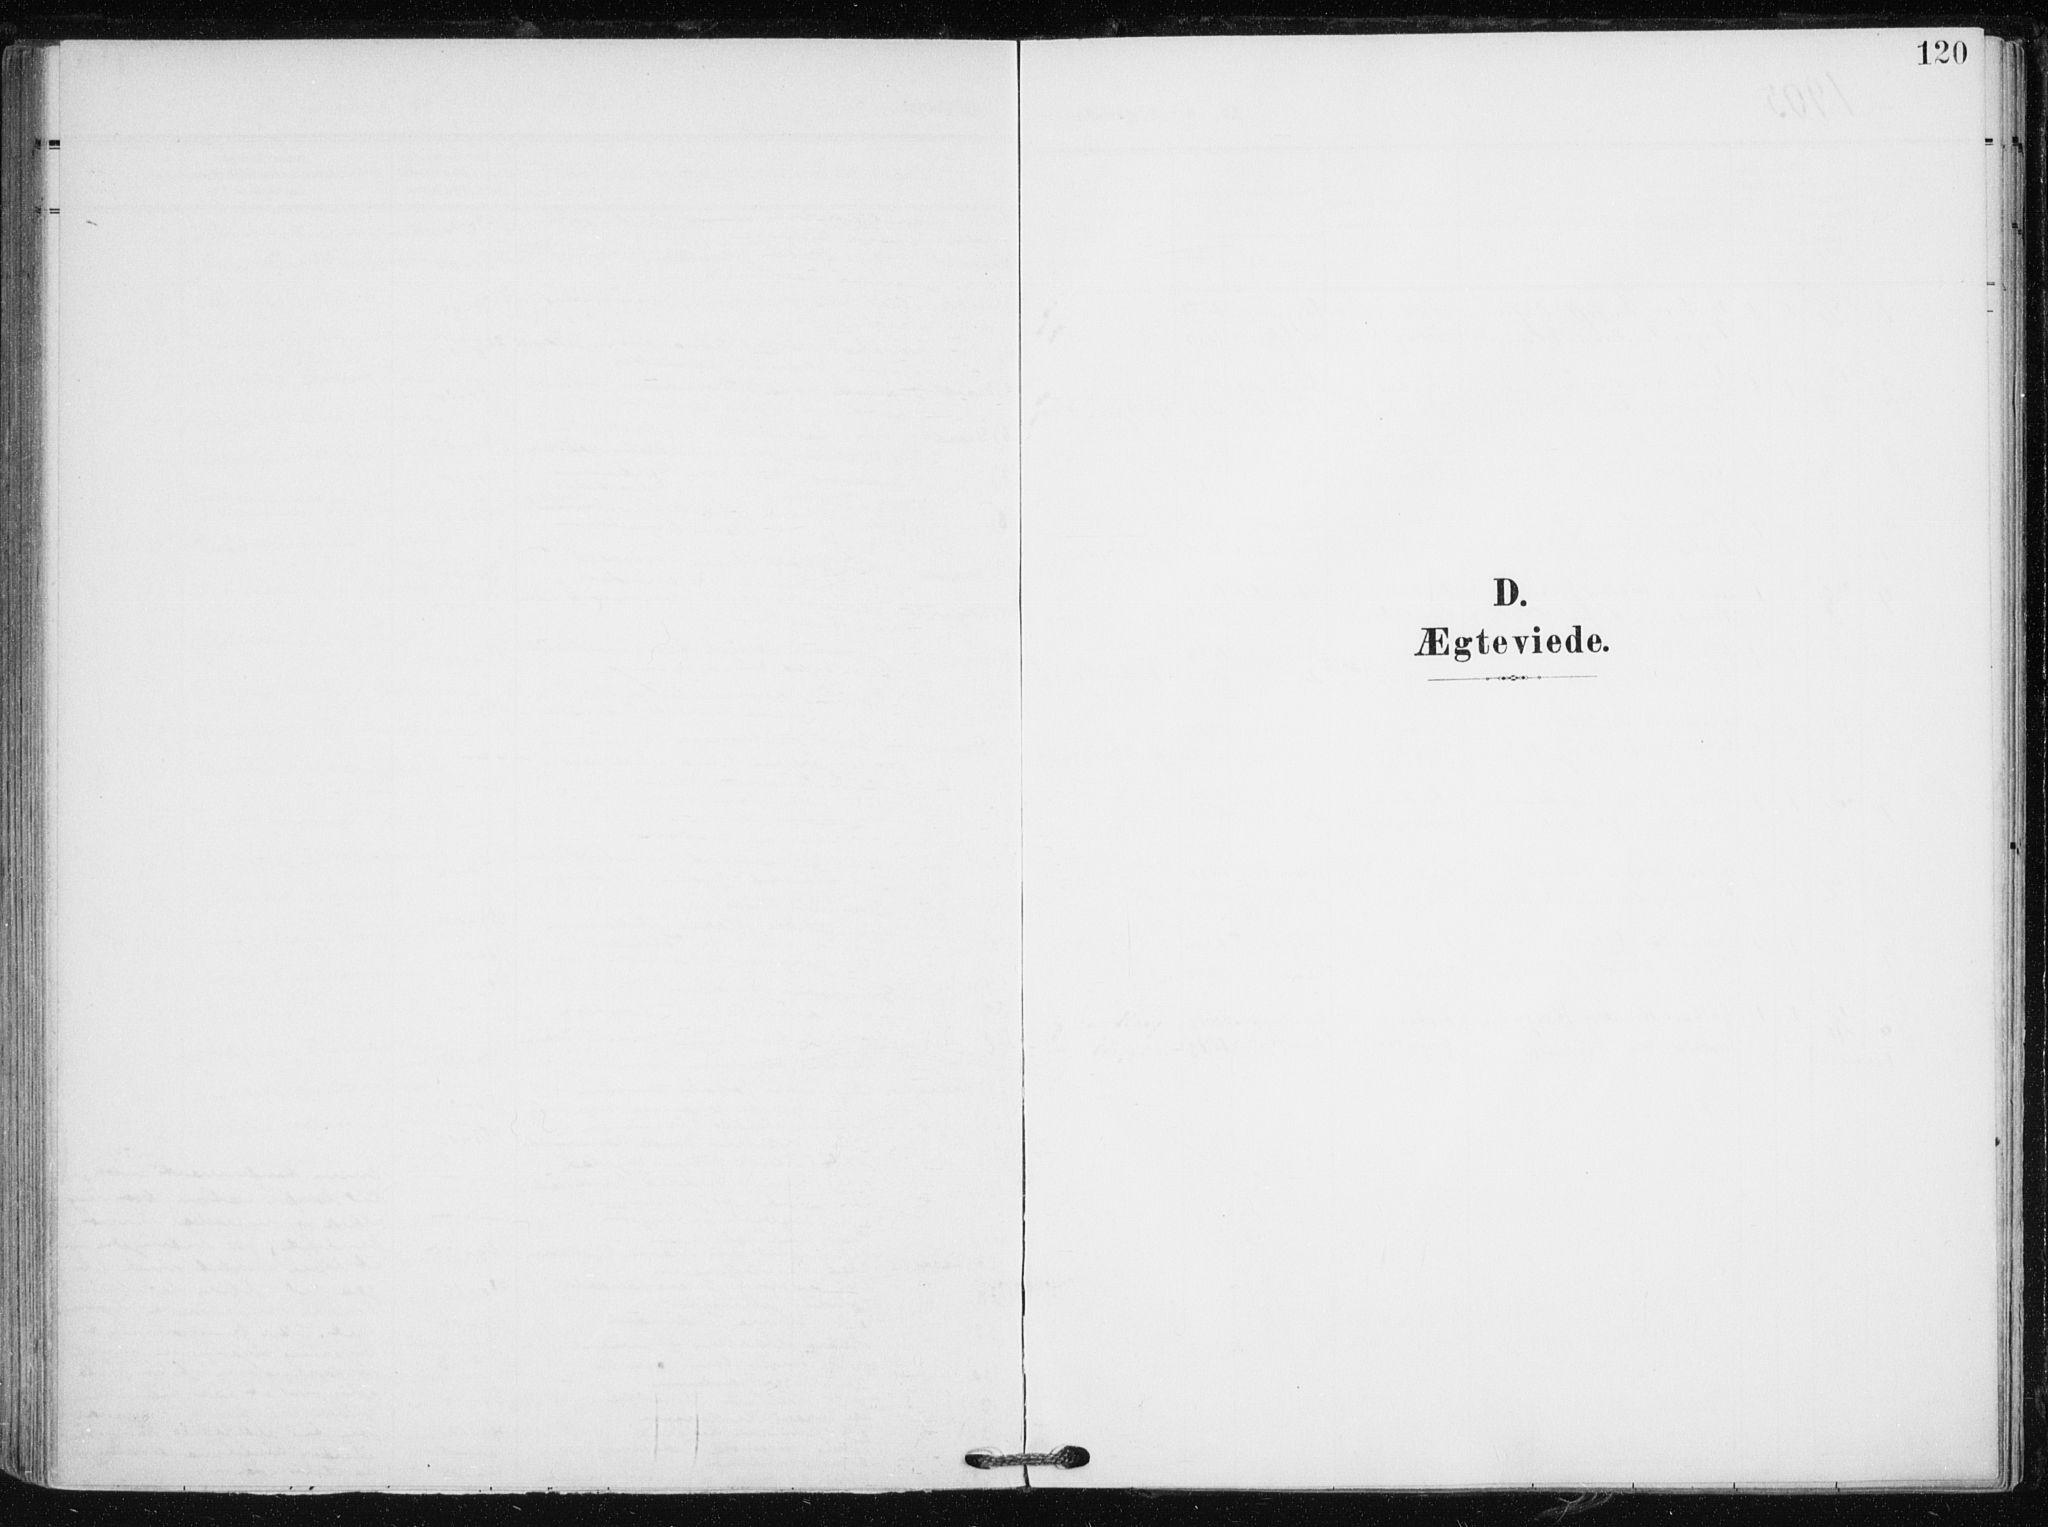 SATØ, Tranøy sokneprestkontor, I/Ia/Iaa/L0012kirke: Ministerialbok nr. 12, 1905-1918, s. 120